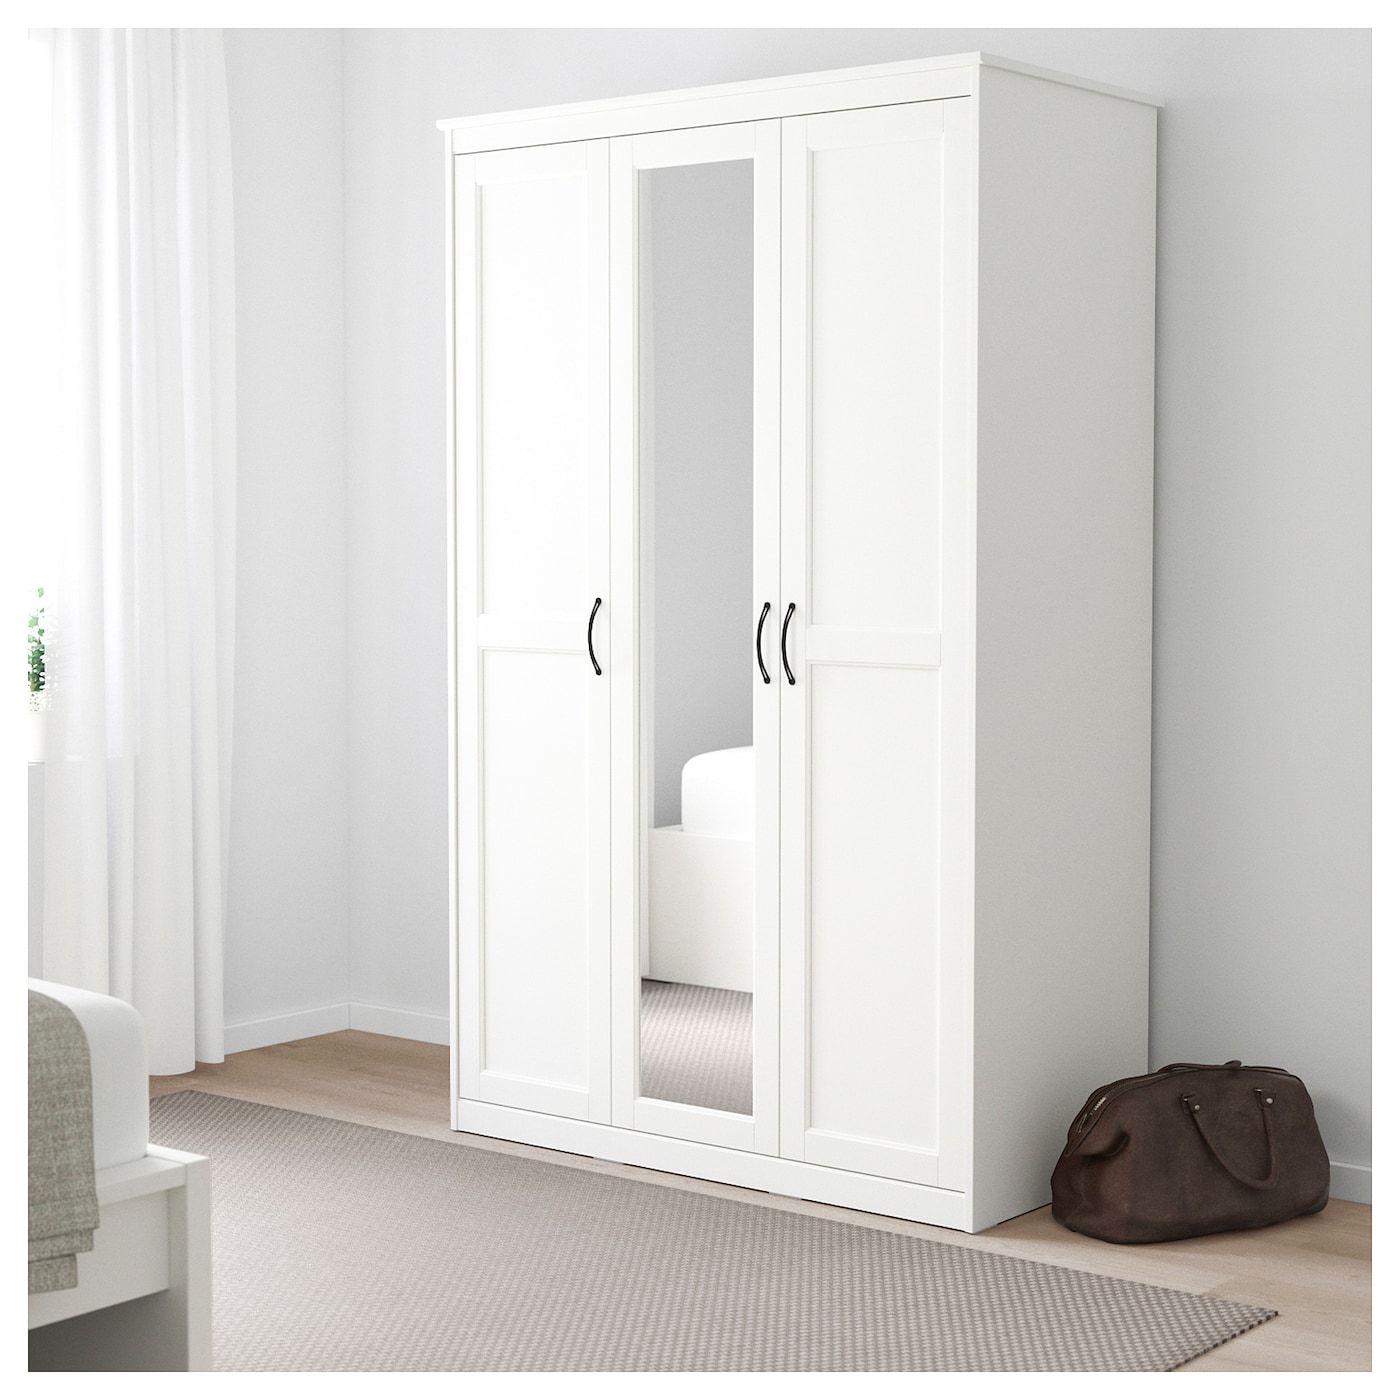 Songesand Wardrobe White Ikea Ikea Wardrobe White Wardrobe